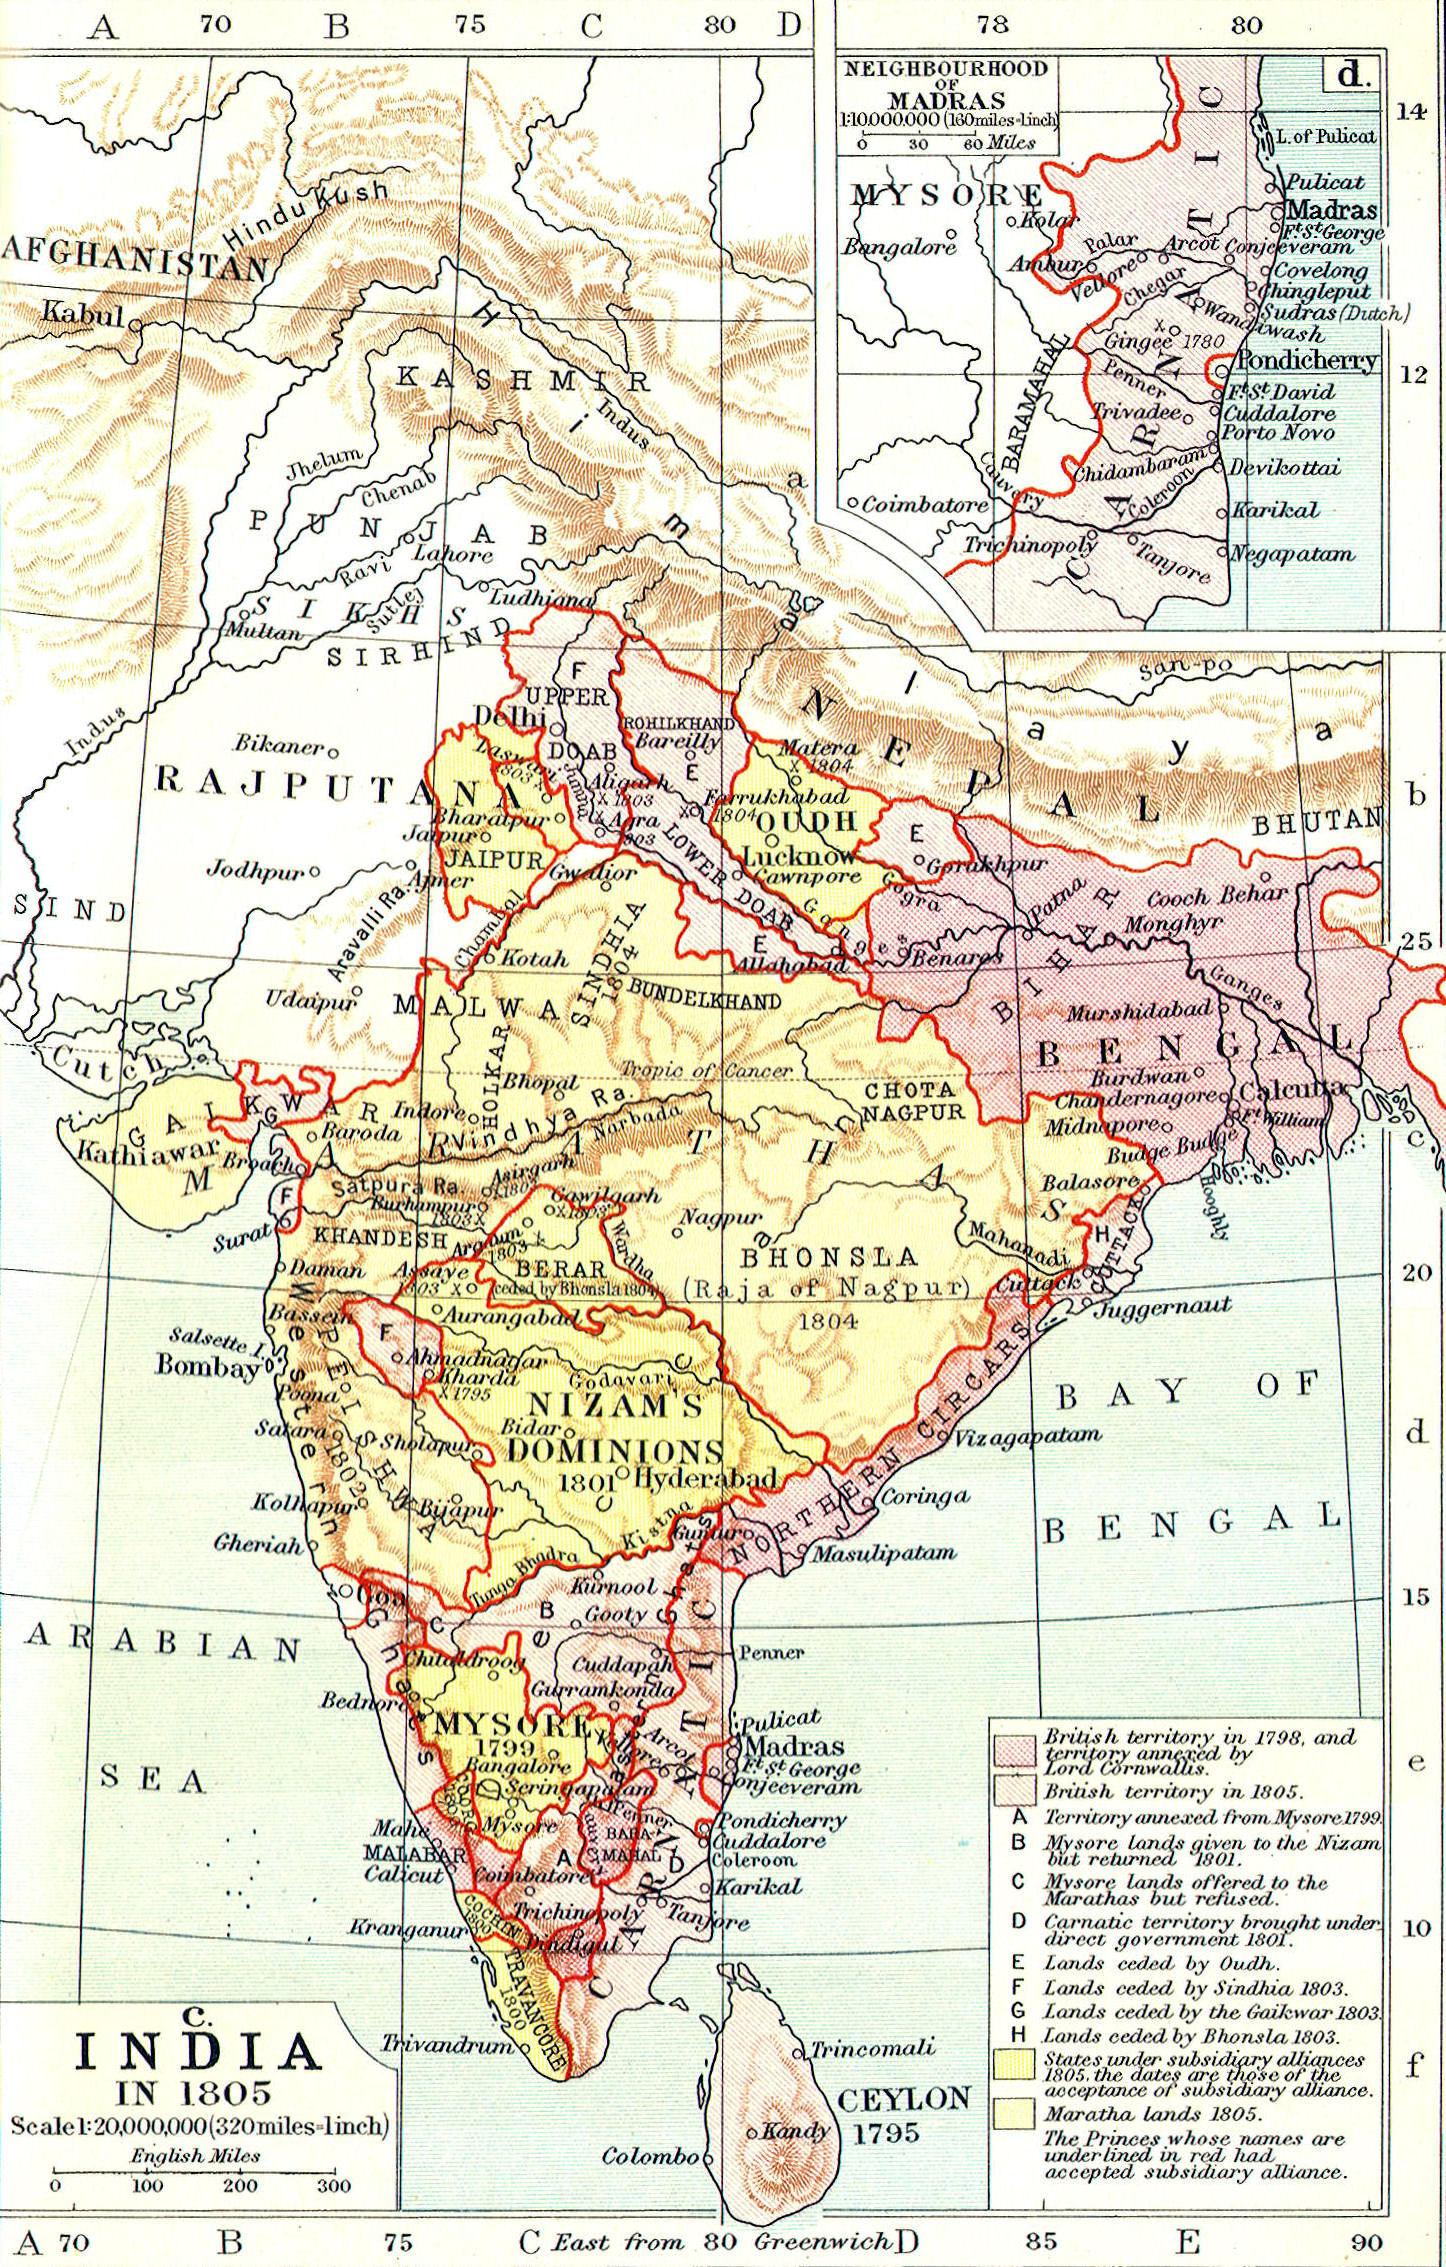 sepoy rebellion «sepoy rebellion» british and european civilian volunteers raised in the bengal presidency 21 princely states ajaigarh alwar bharathpur bhopal bijawar.